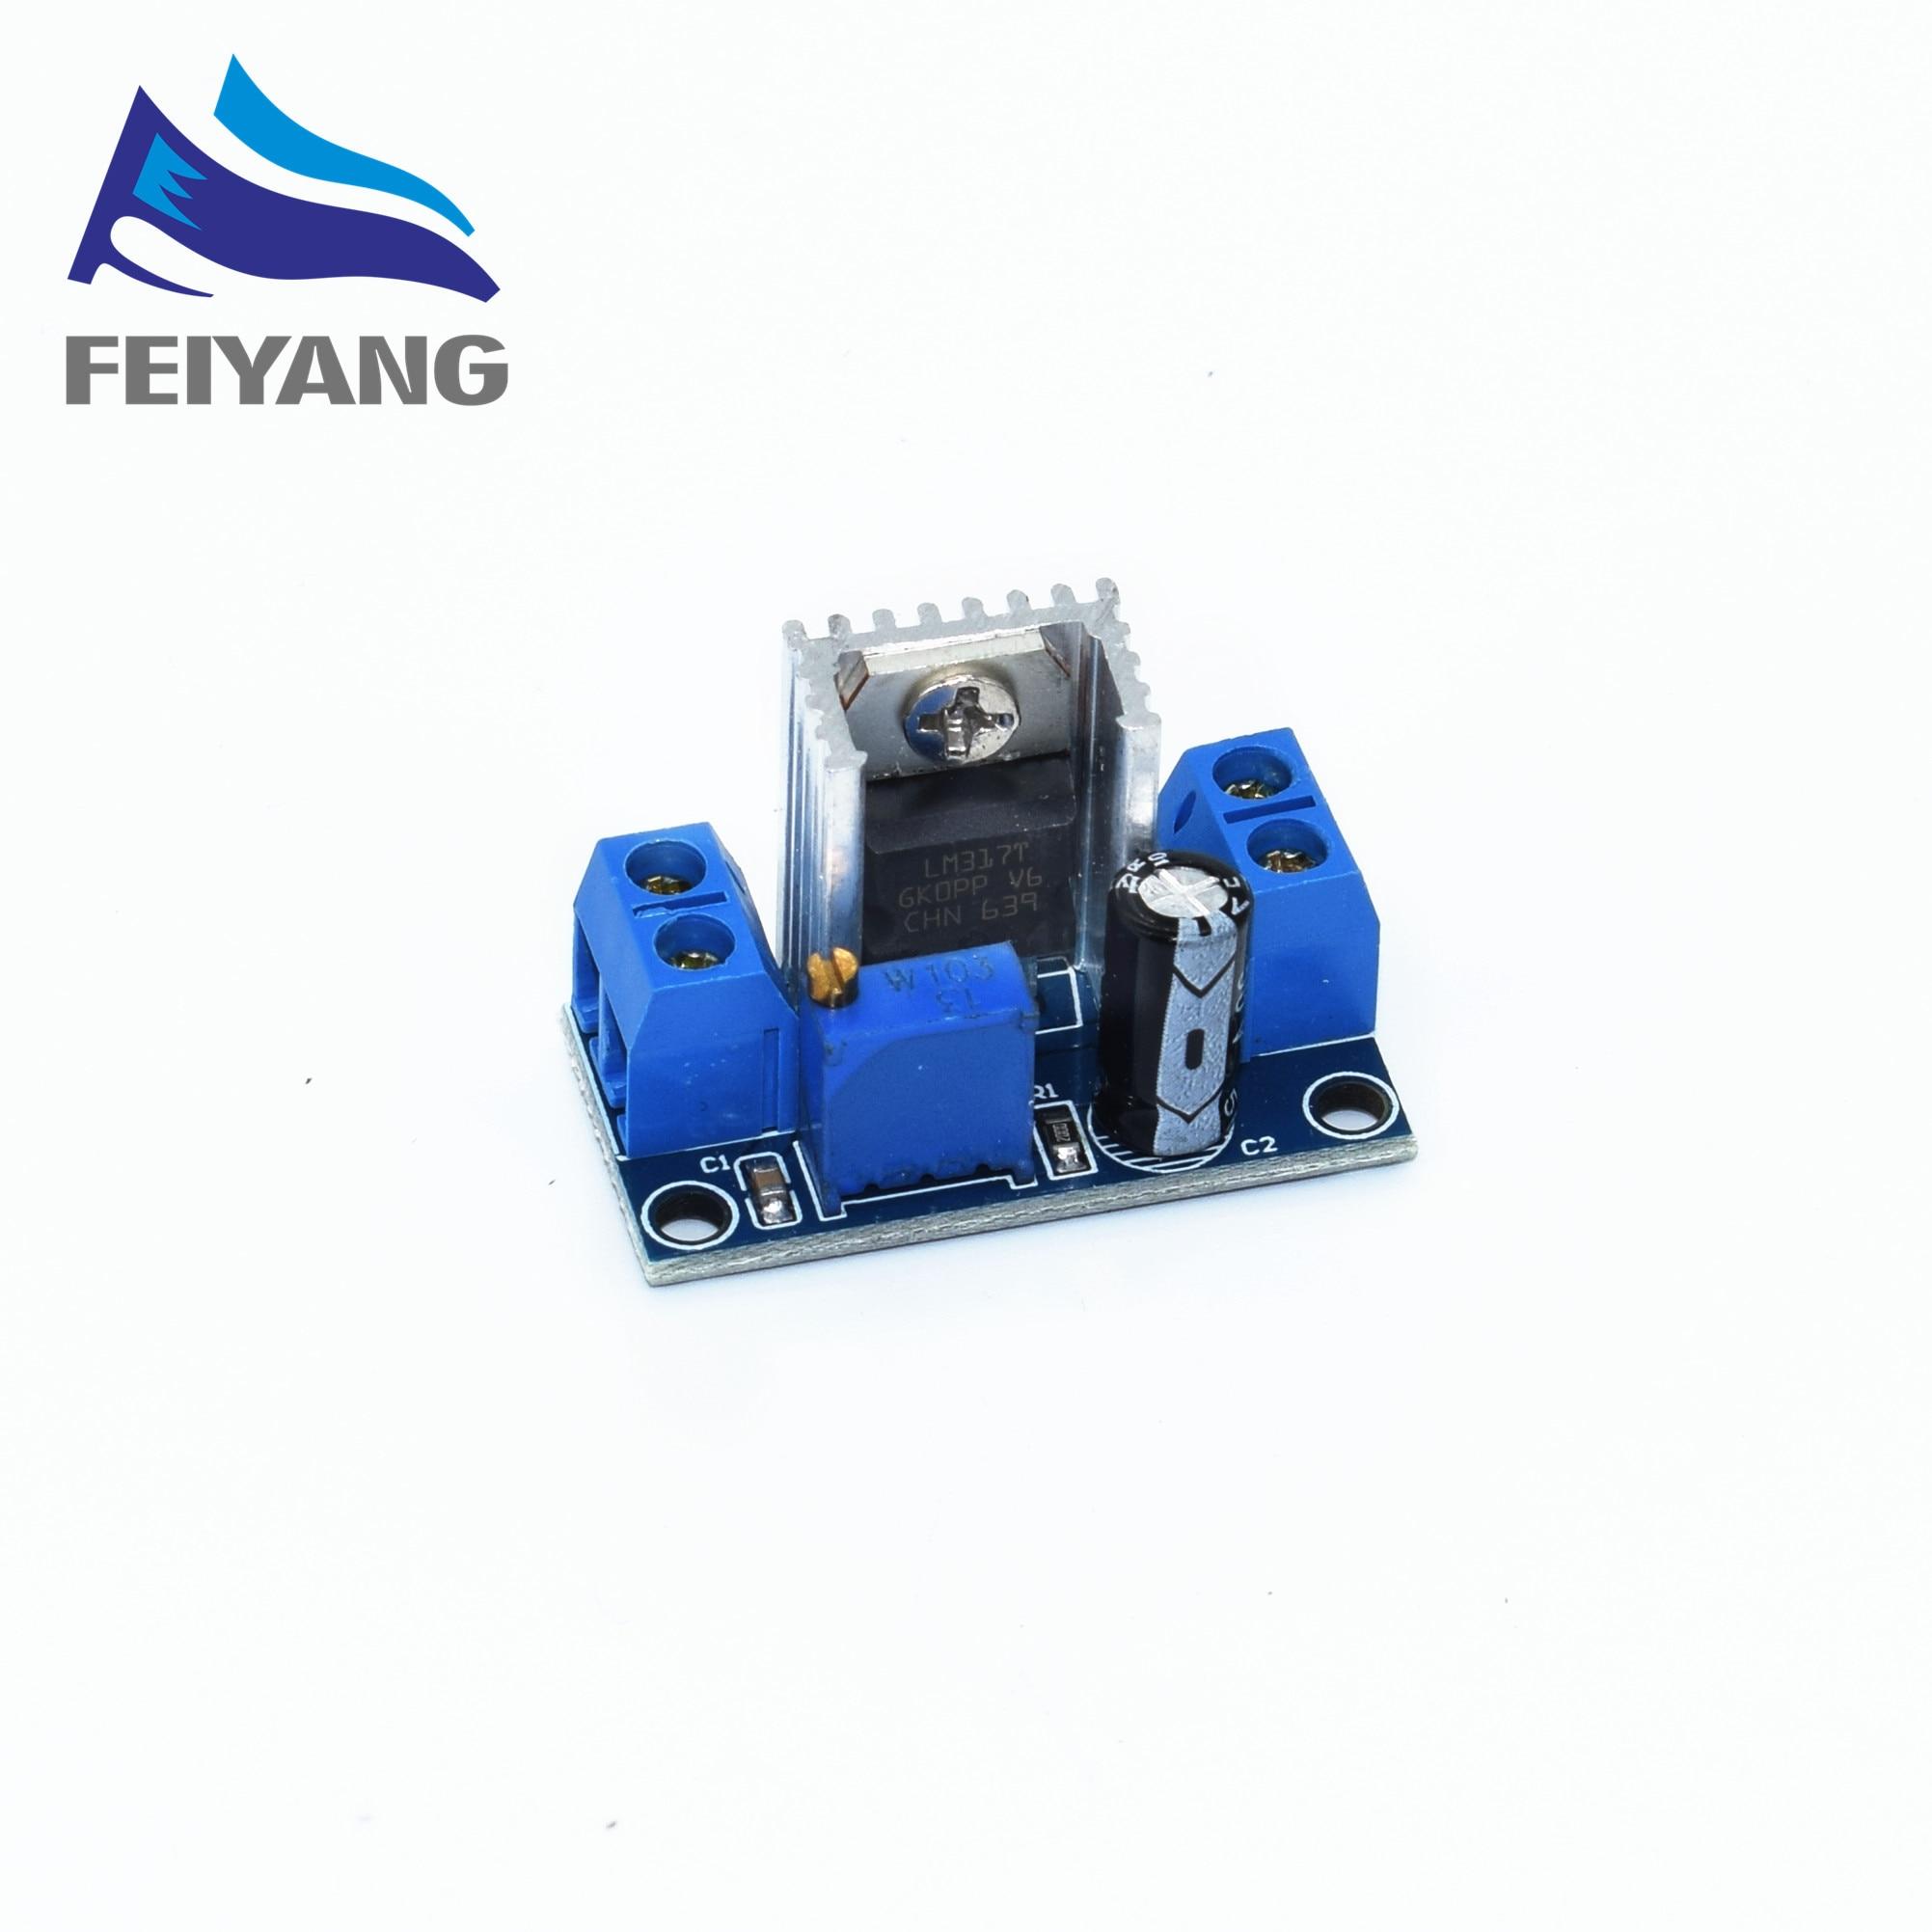 10pcs Lm317 Adjustable Voltage Regulator Power Supply